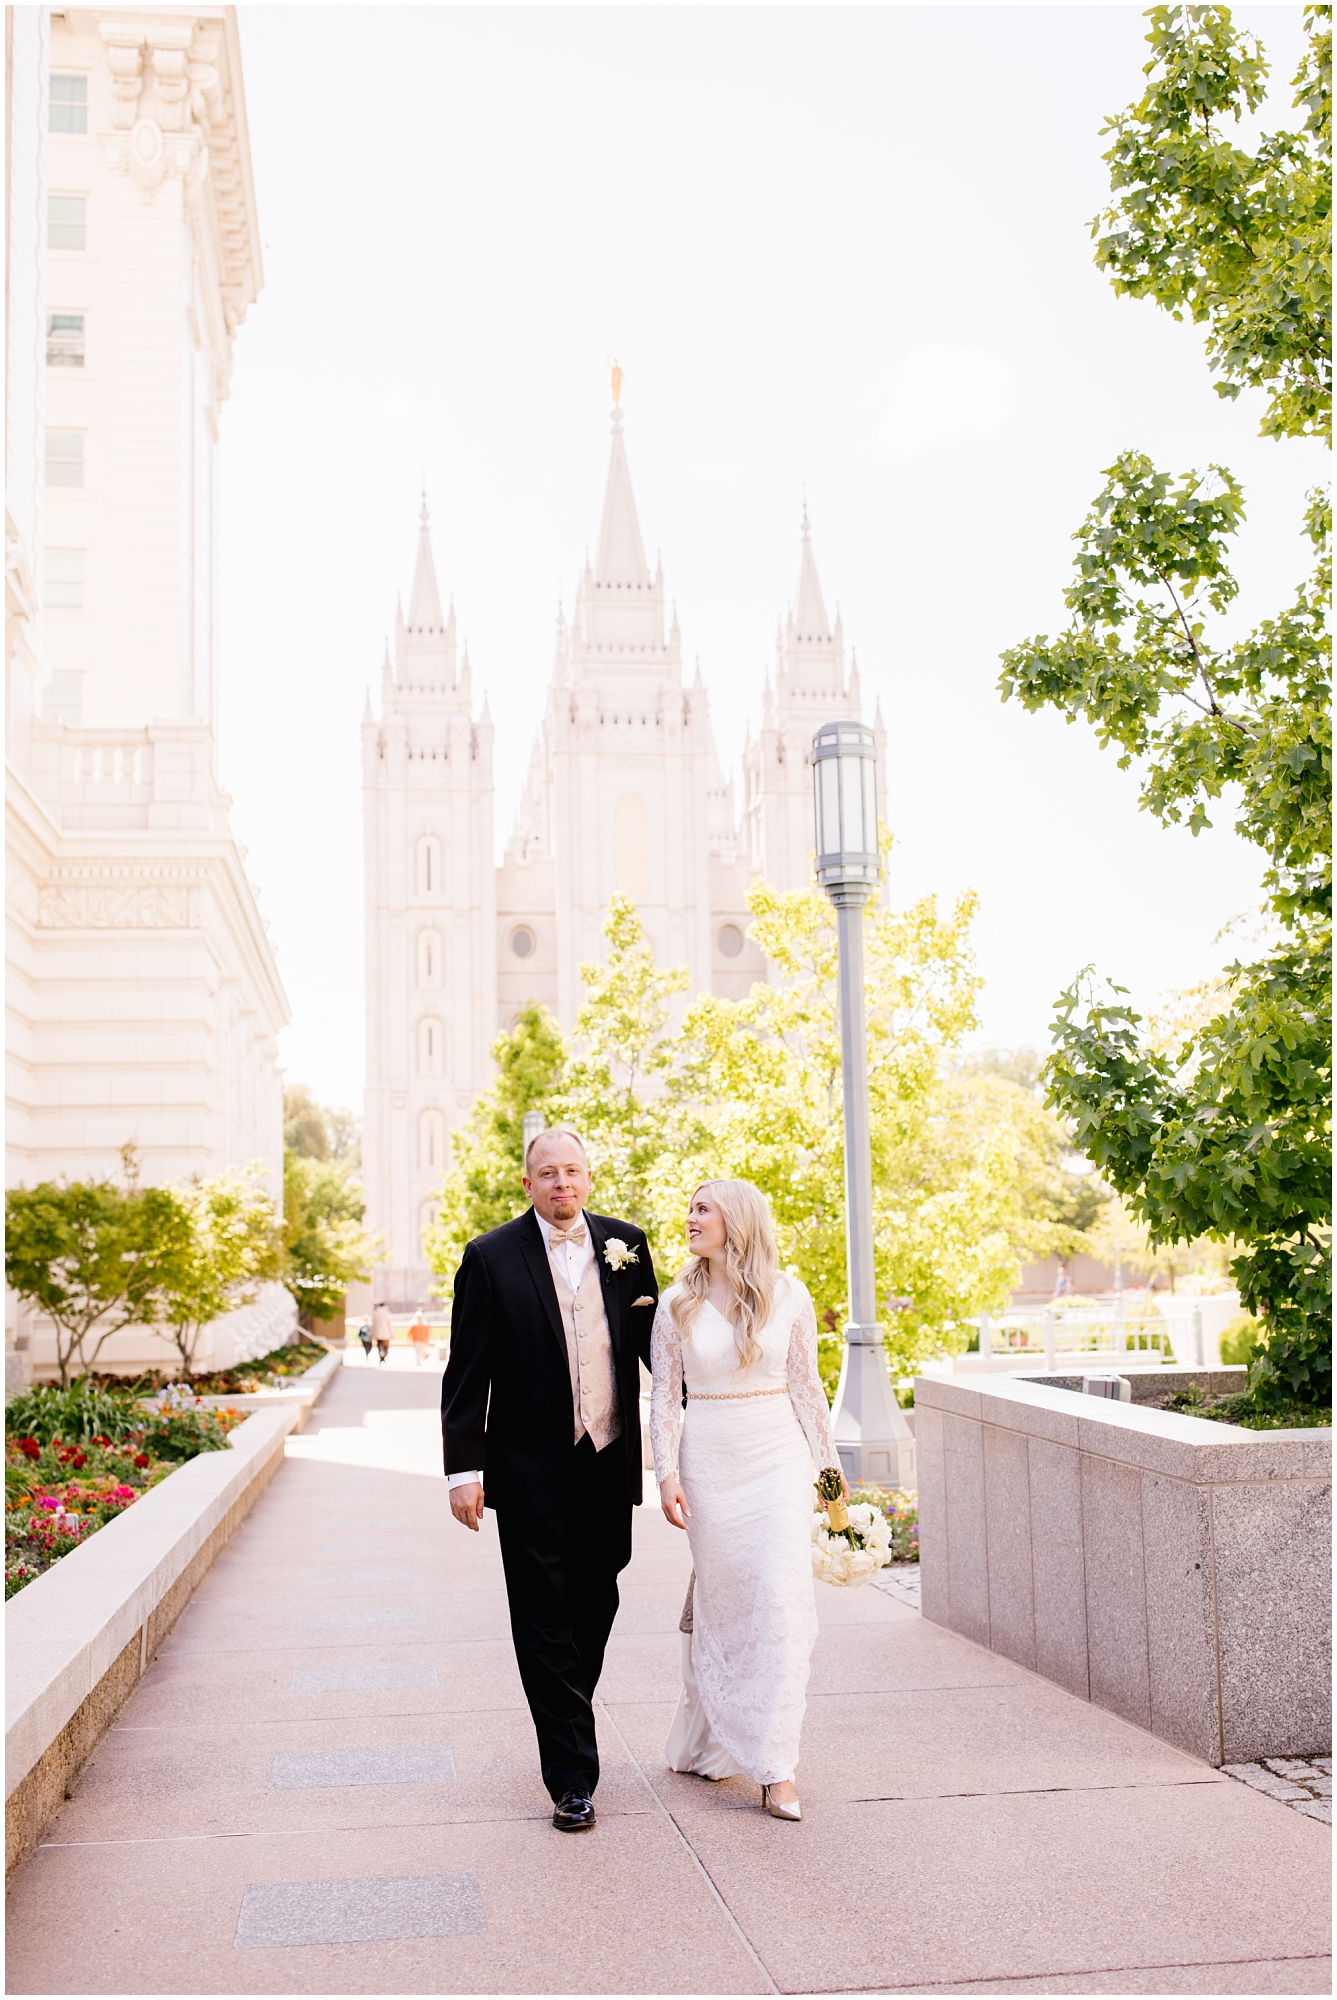 CherylandTyler-295_Lizzie-B-Imagery-Utah-Wedding-Photographer-Park-City-Salt-Lake-City-Temple-Wells-Fargo-Building.jpg